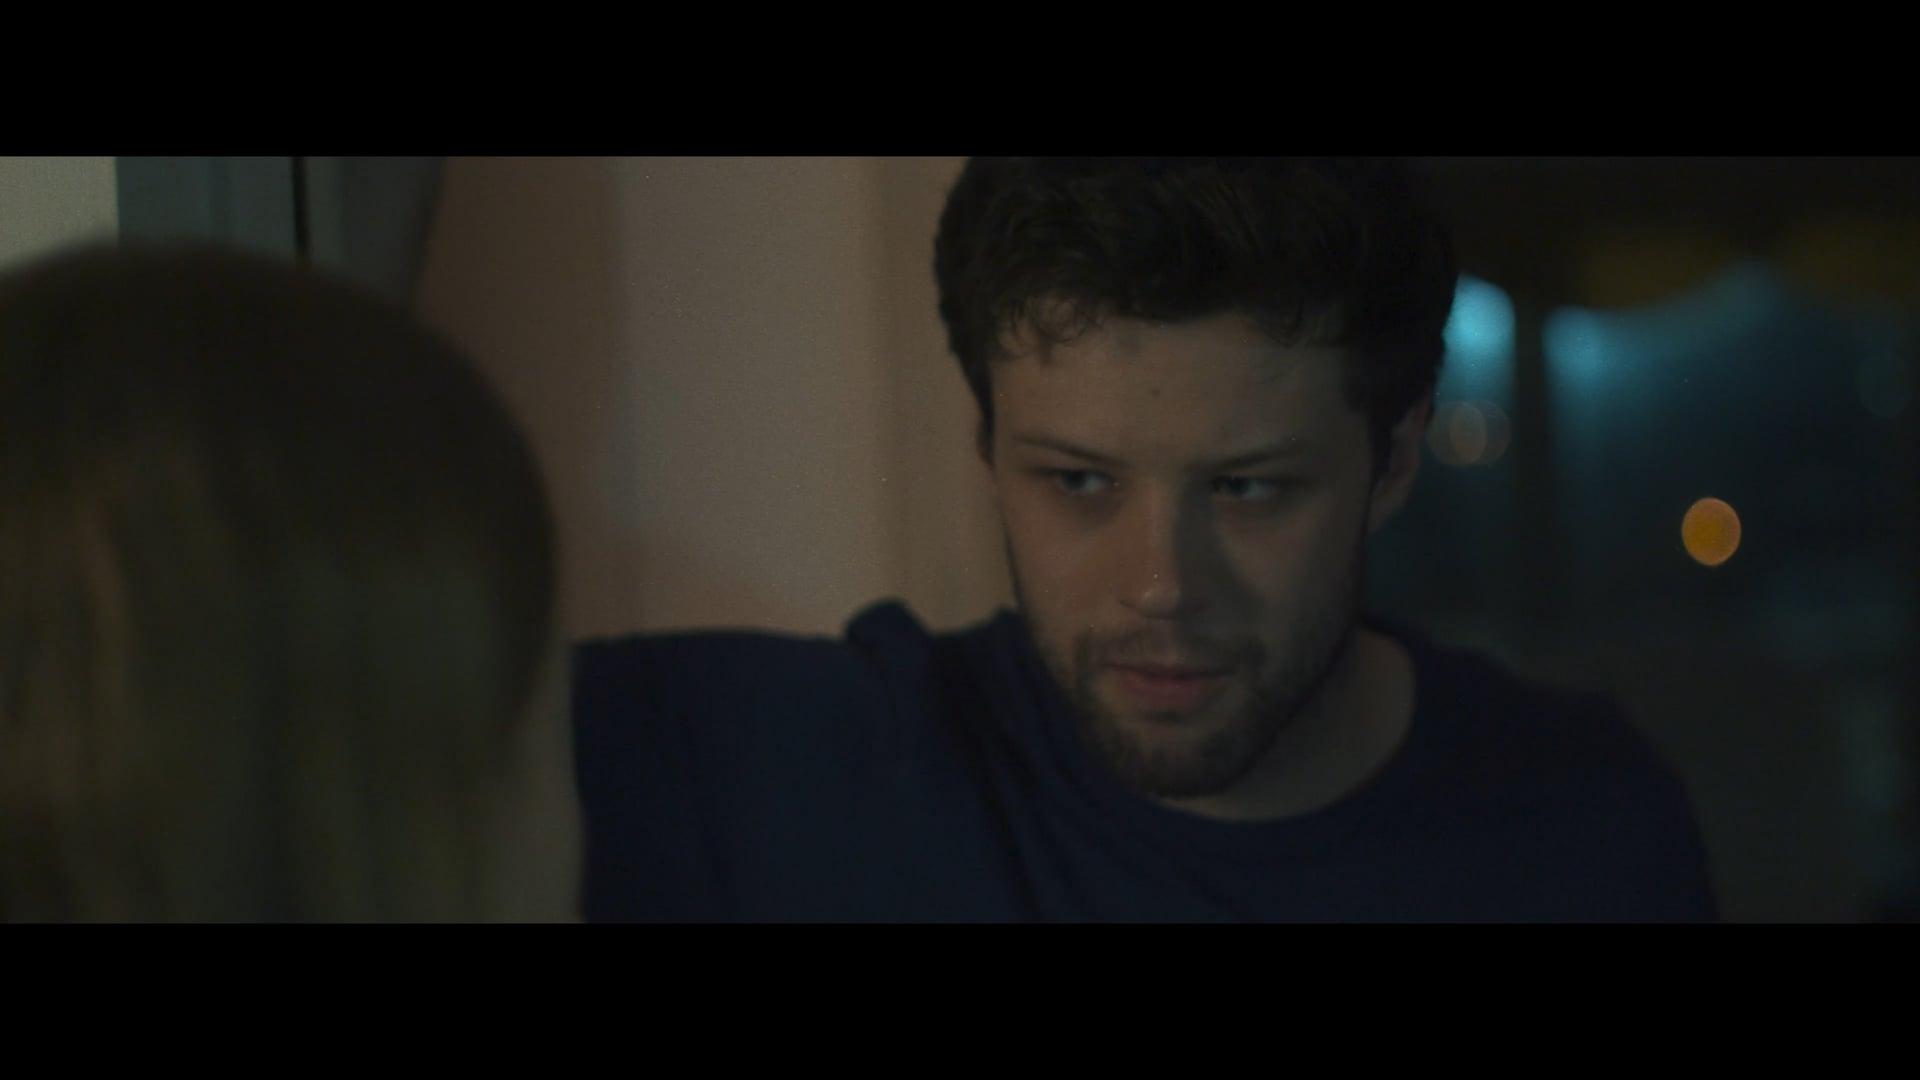 We Were The Night - Teaser Trailer